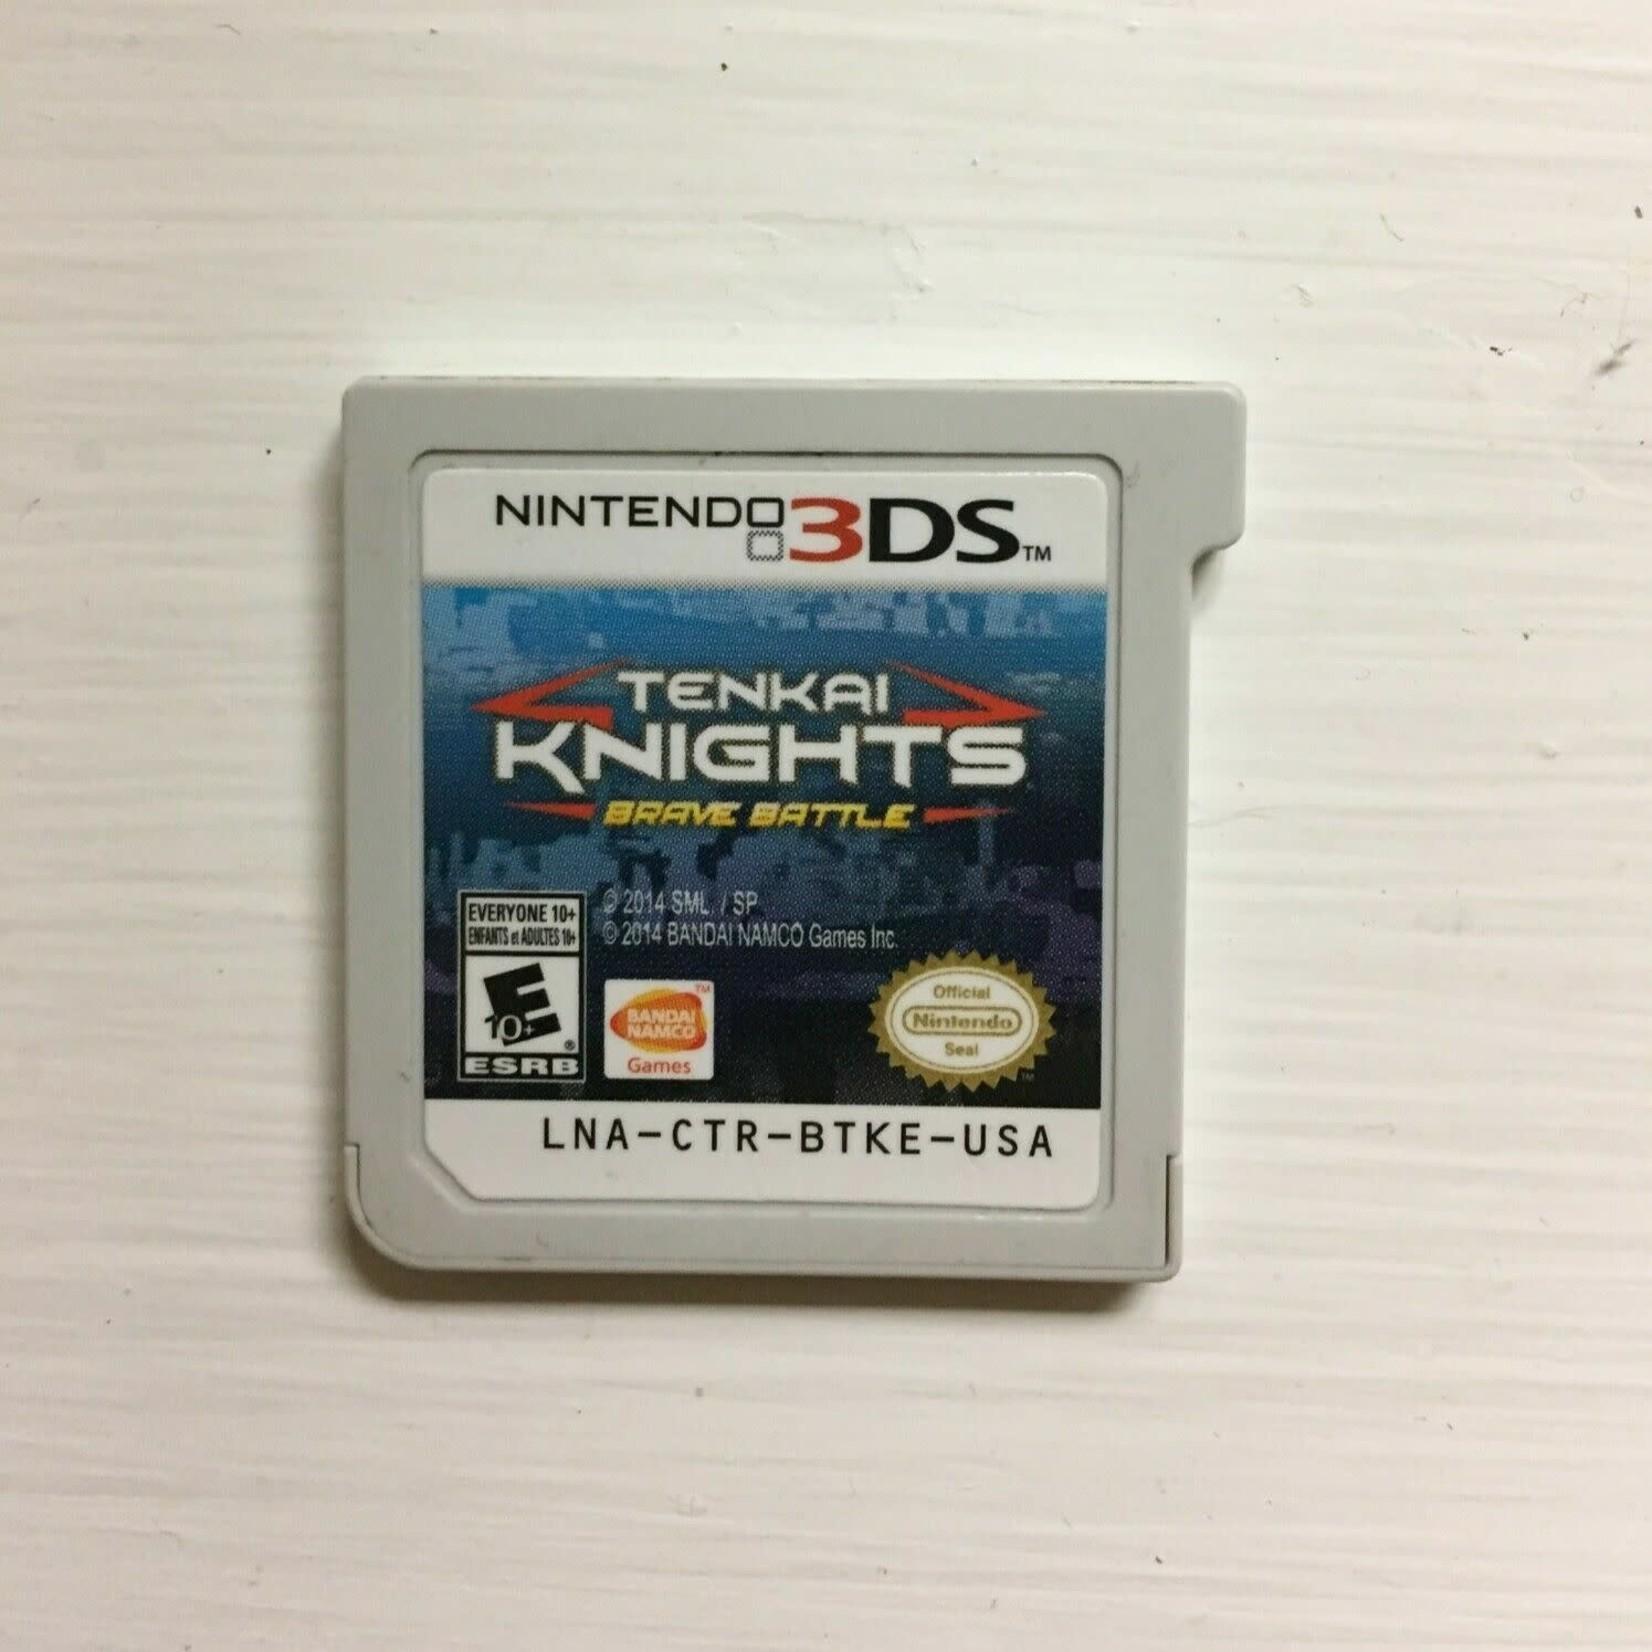 3DSu-Tenkai Knights (chip only)